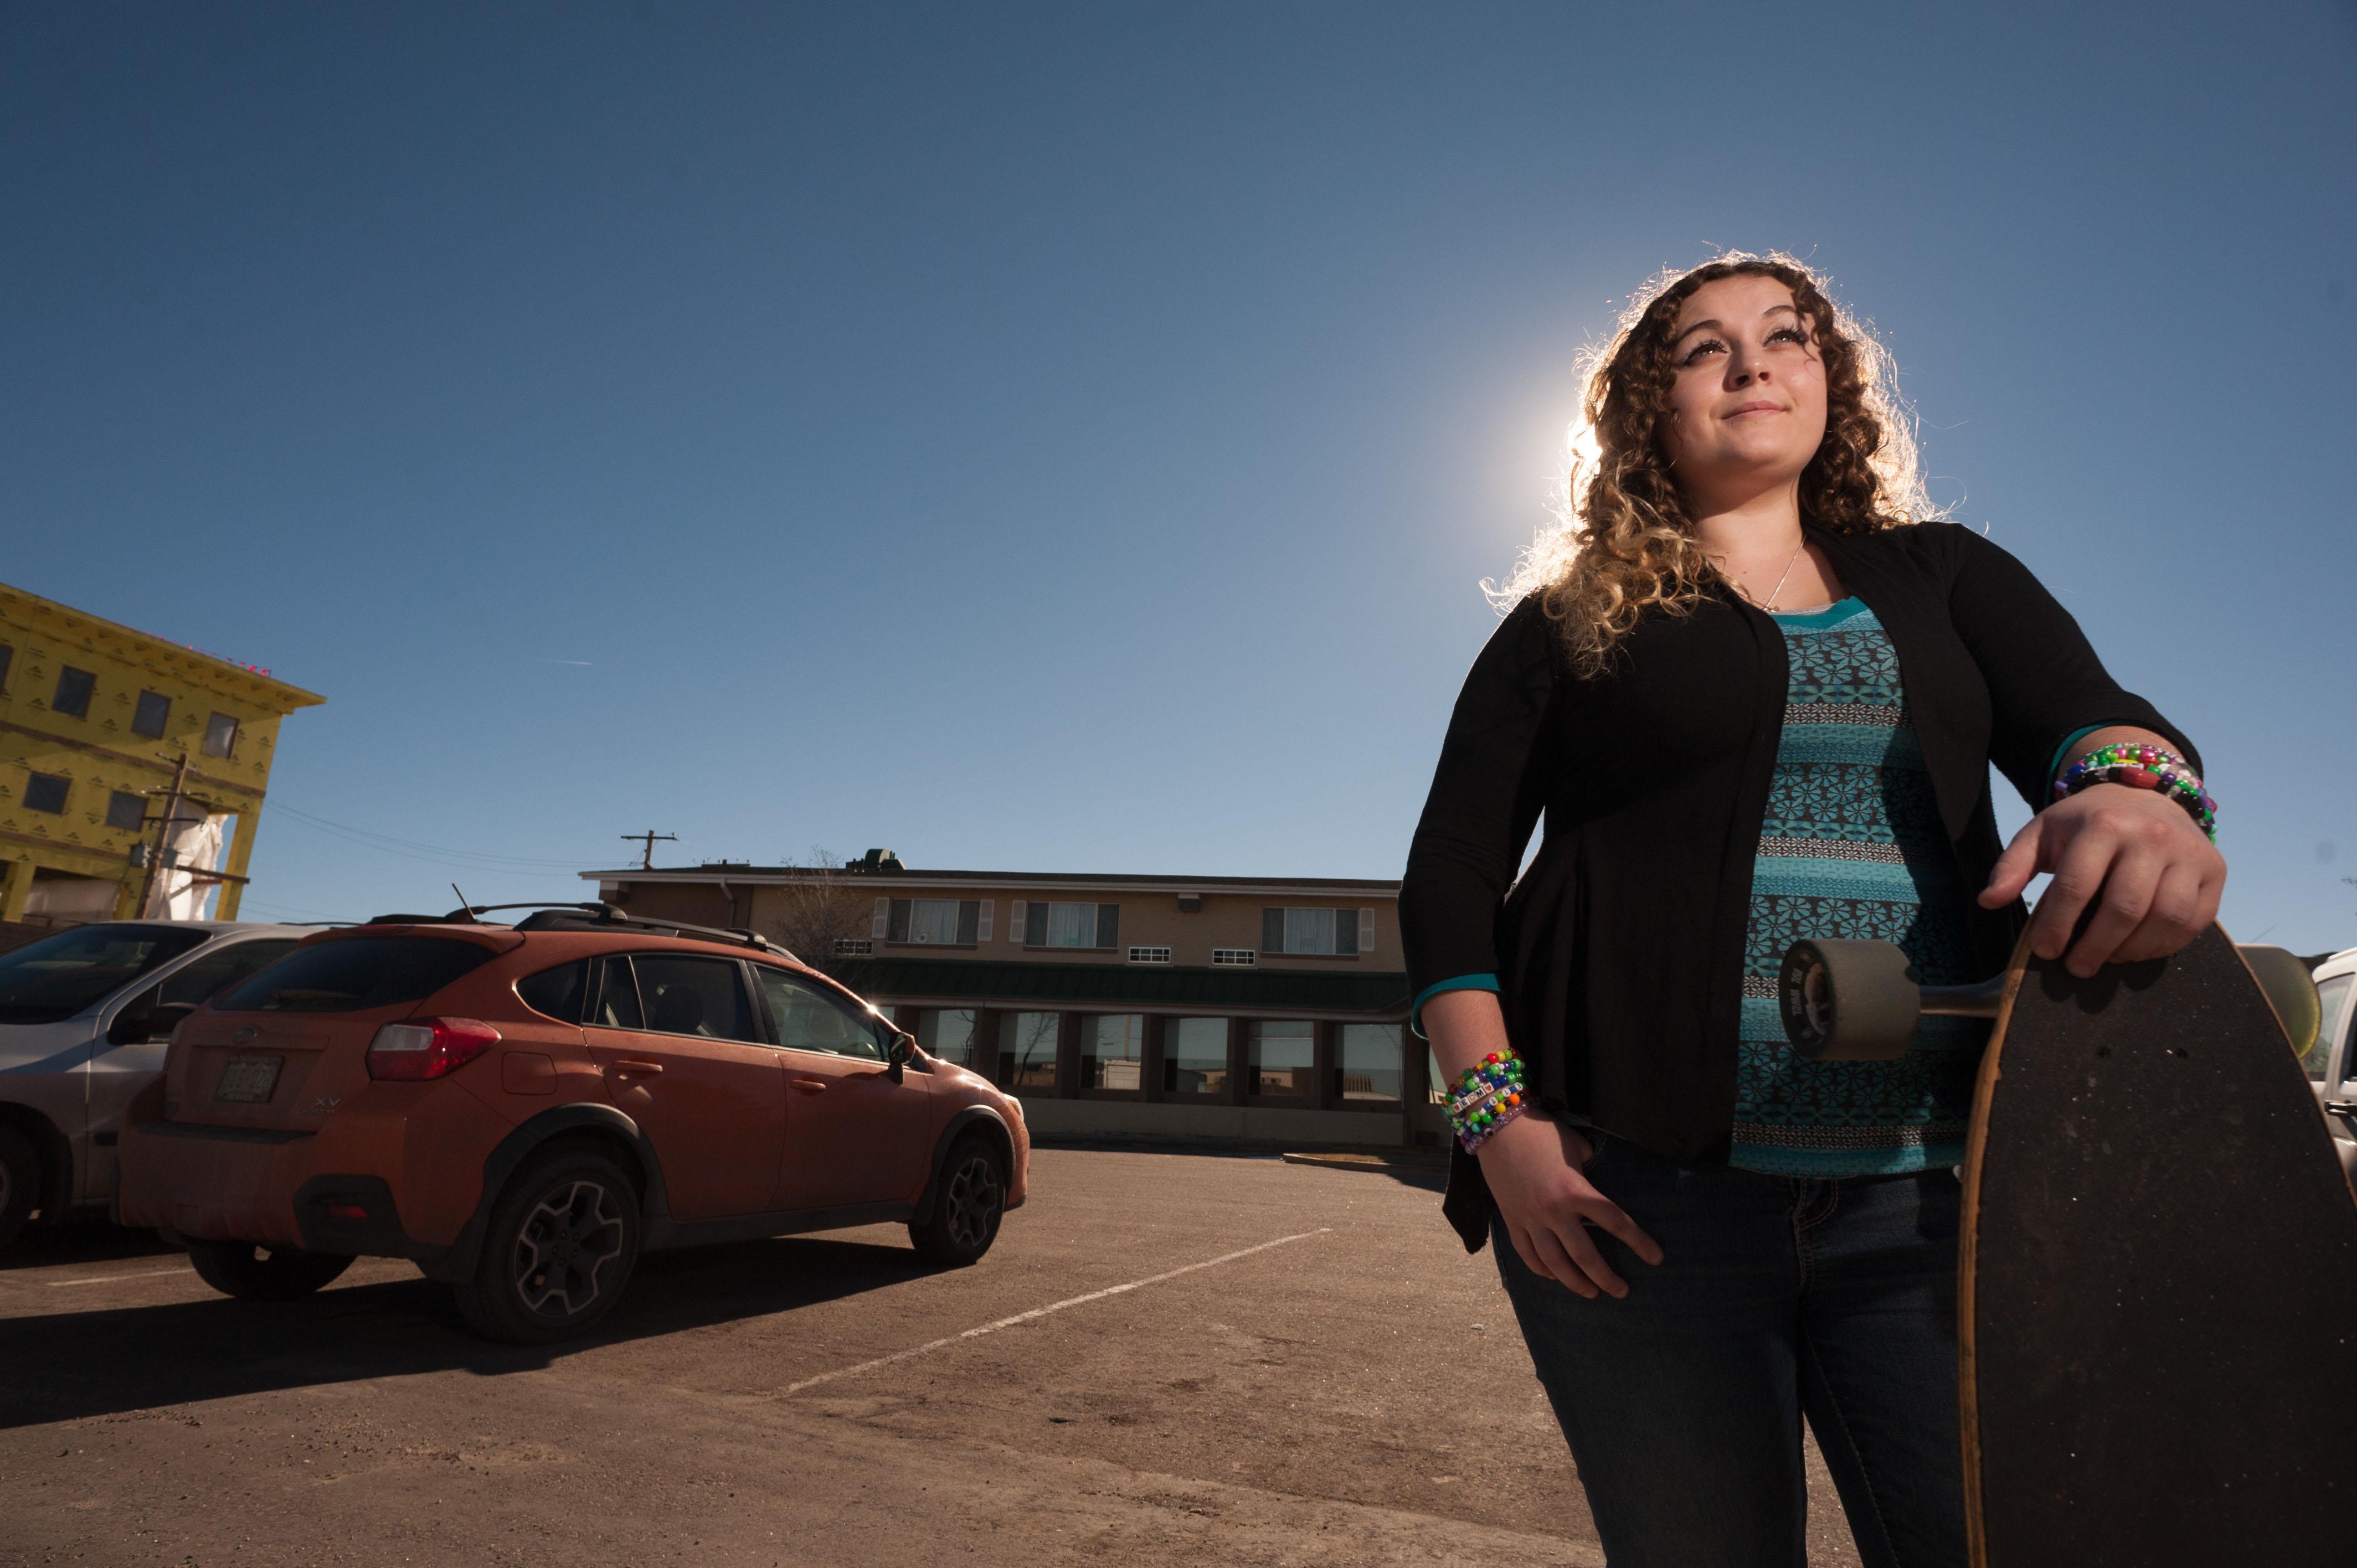 Photo: Destiny Carney with her skateboard